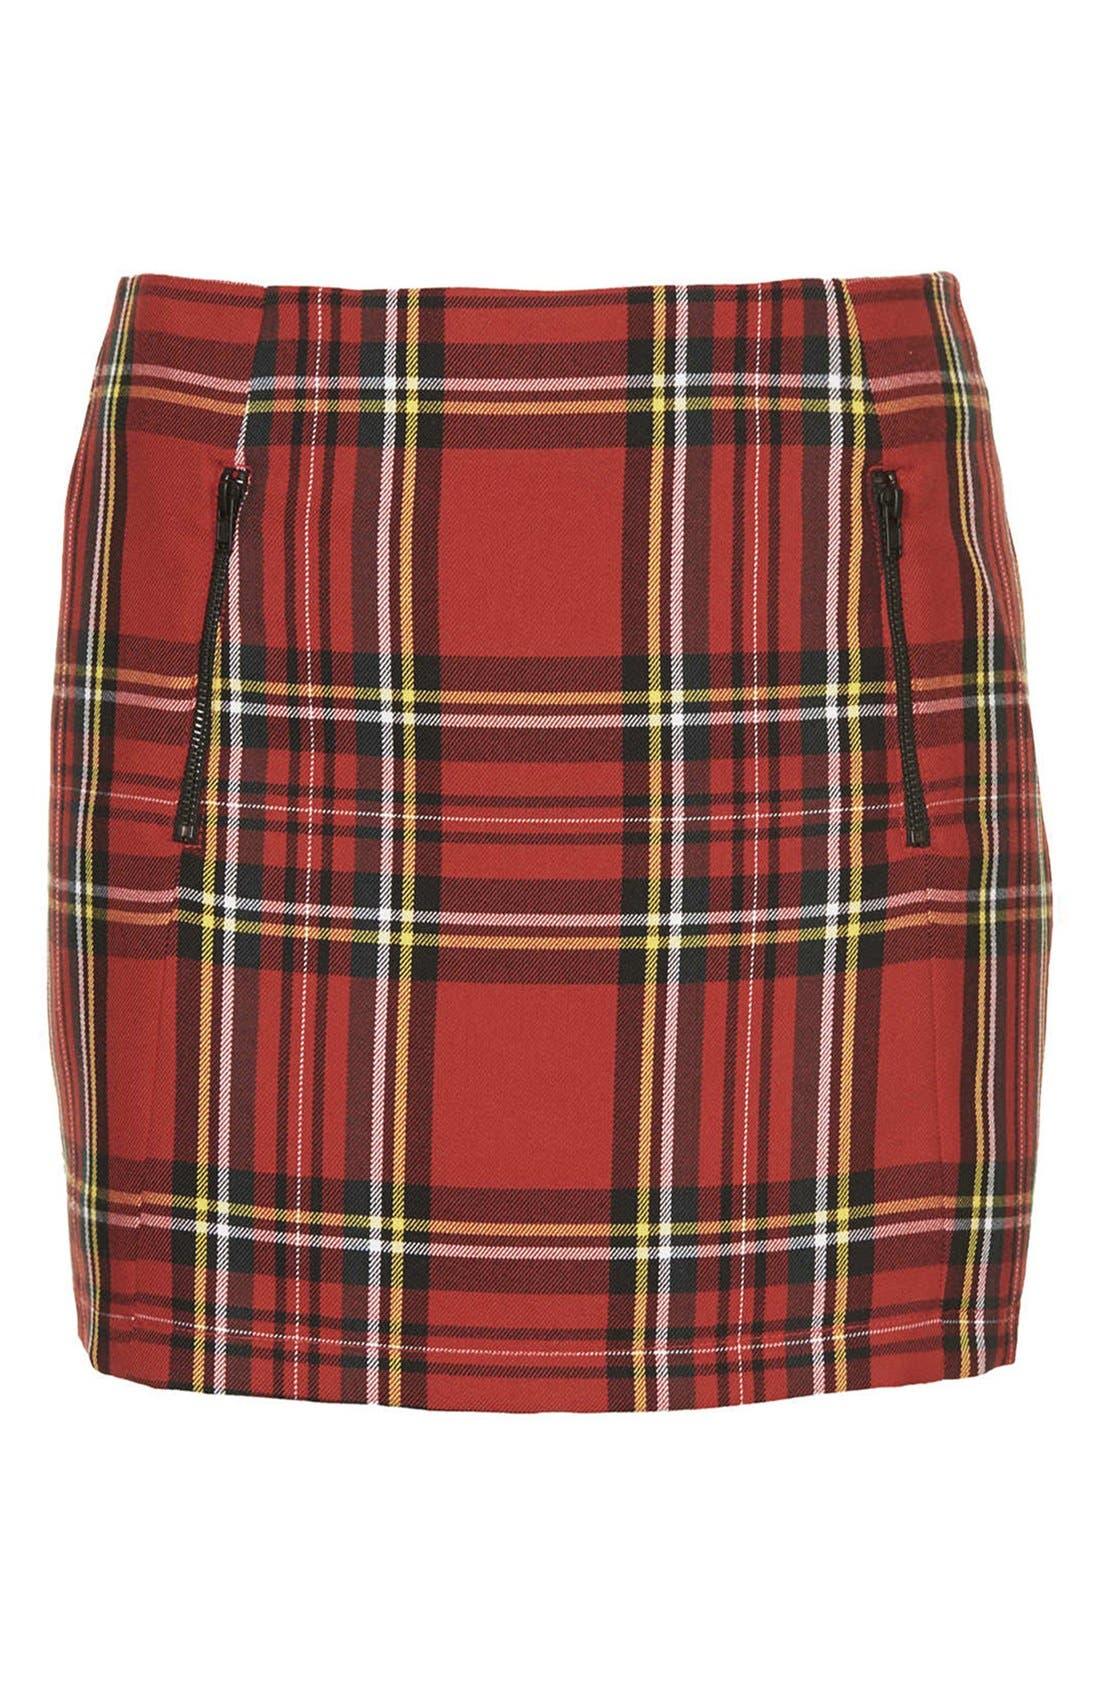 Alternate Image 3  - Topshop Tartan Plaid Skirt